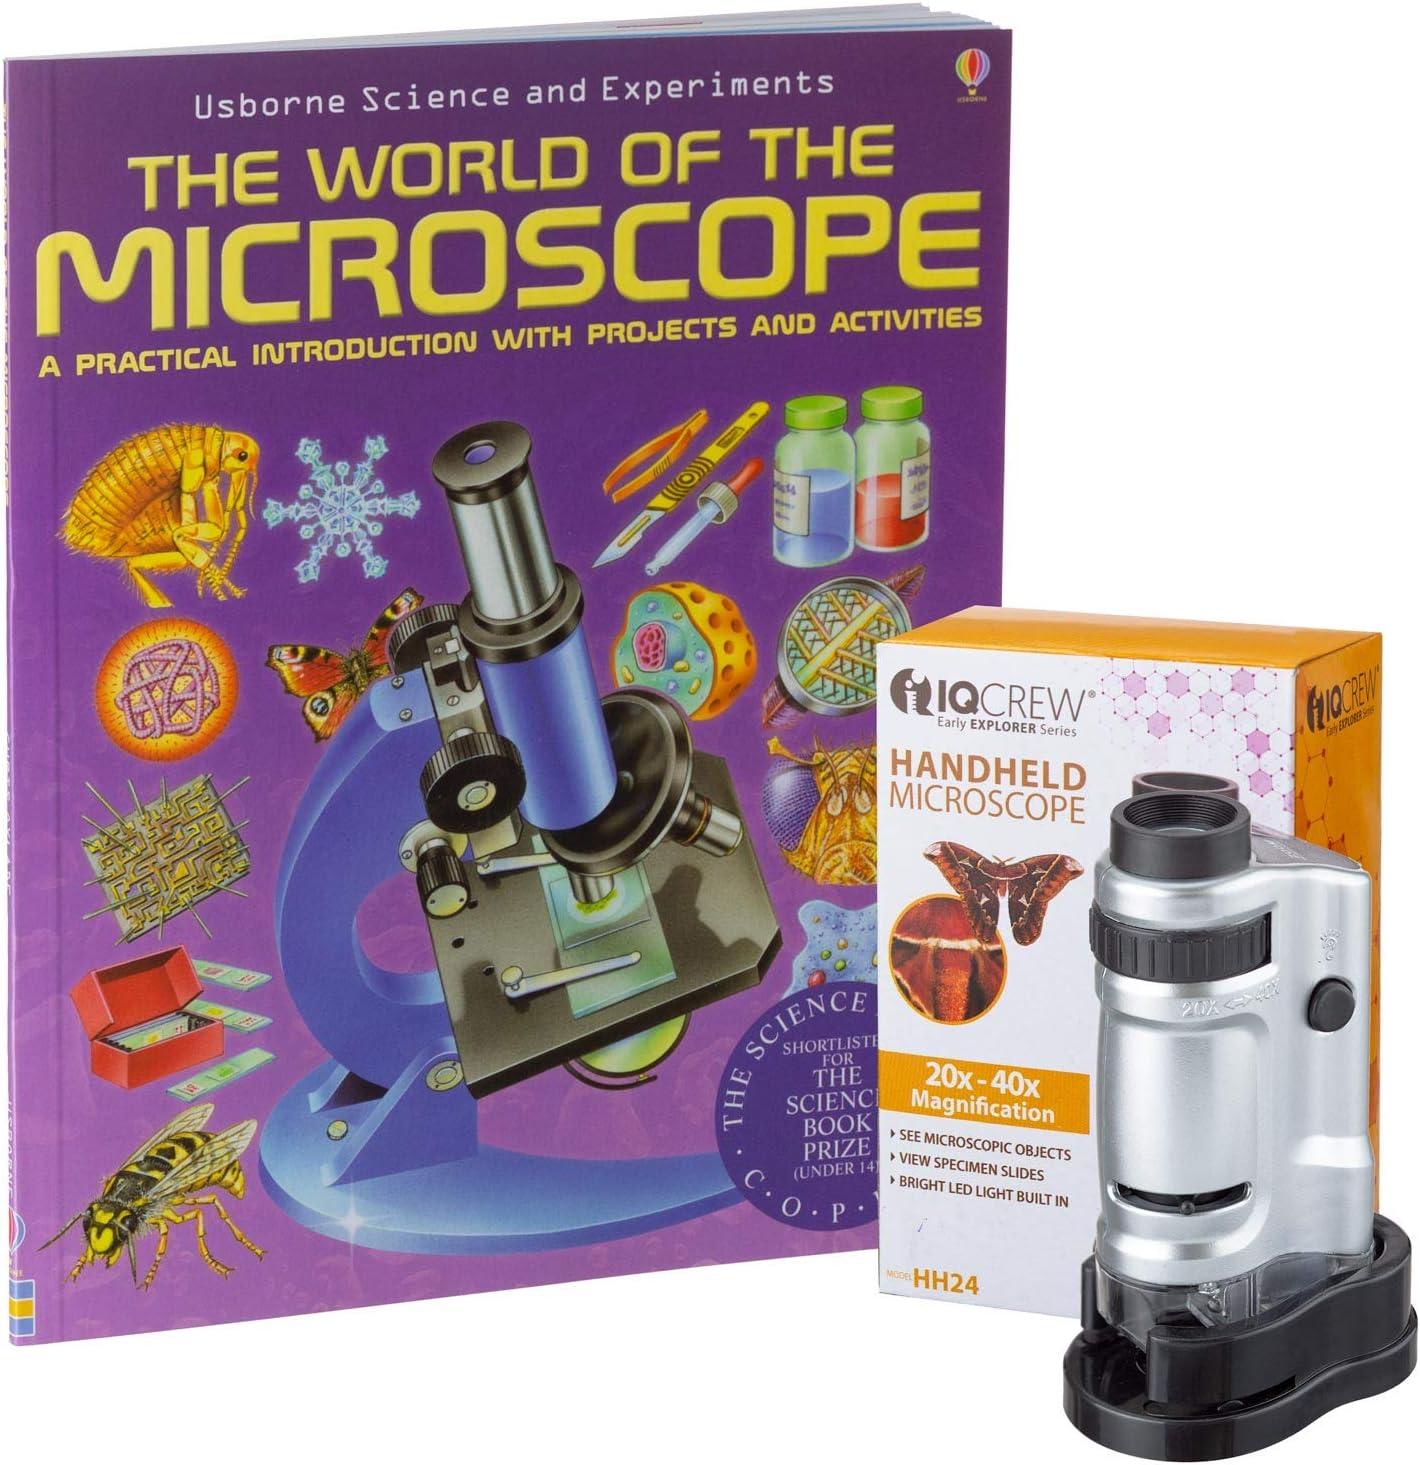 IQCrew by AmScope 20X-40X Kids Handheld LED Pocket Jacksonville Mall + supreme Microscope